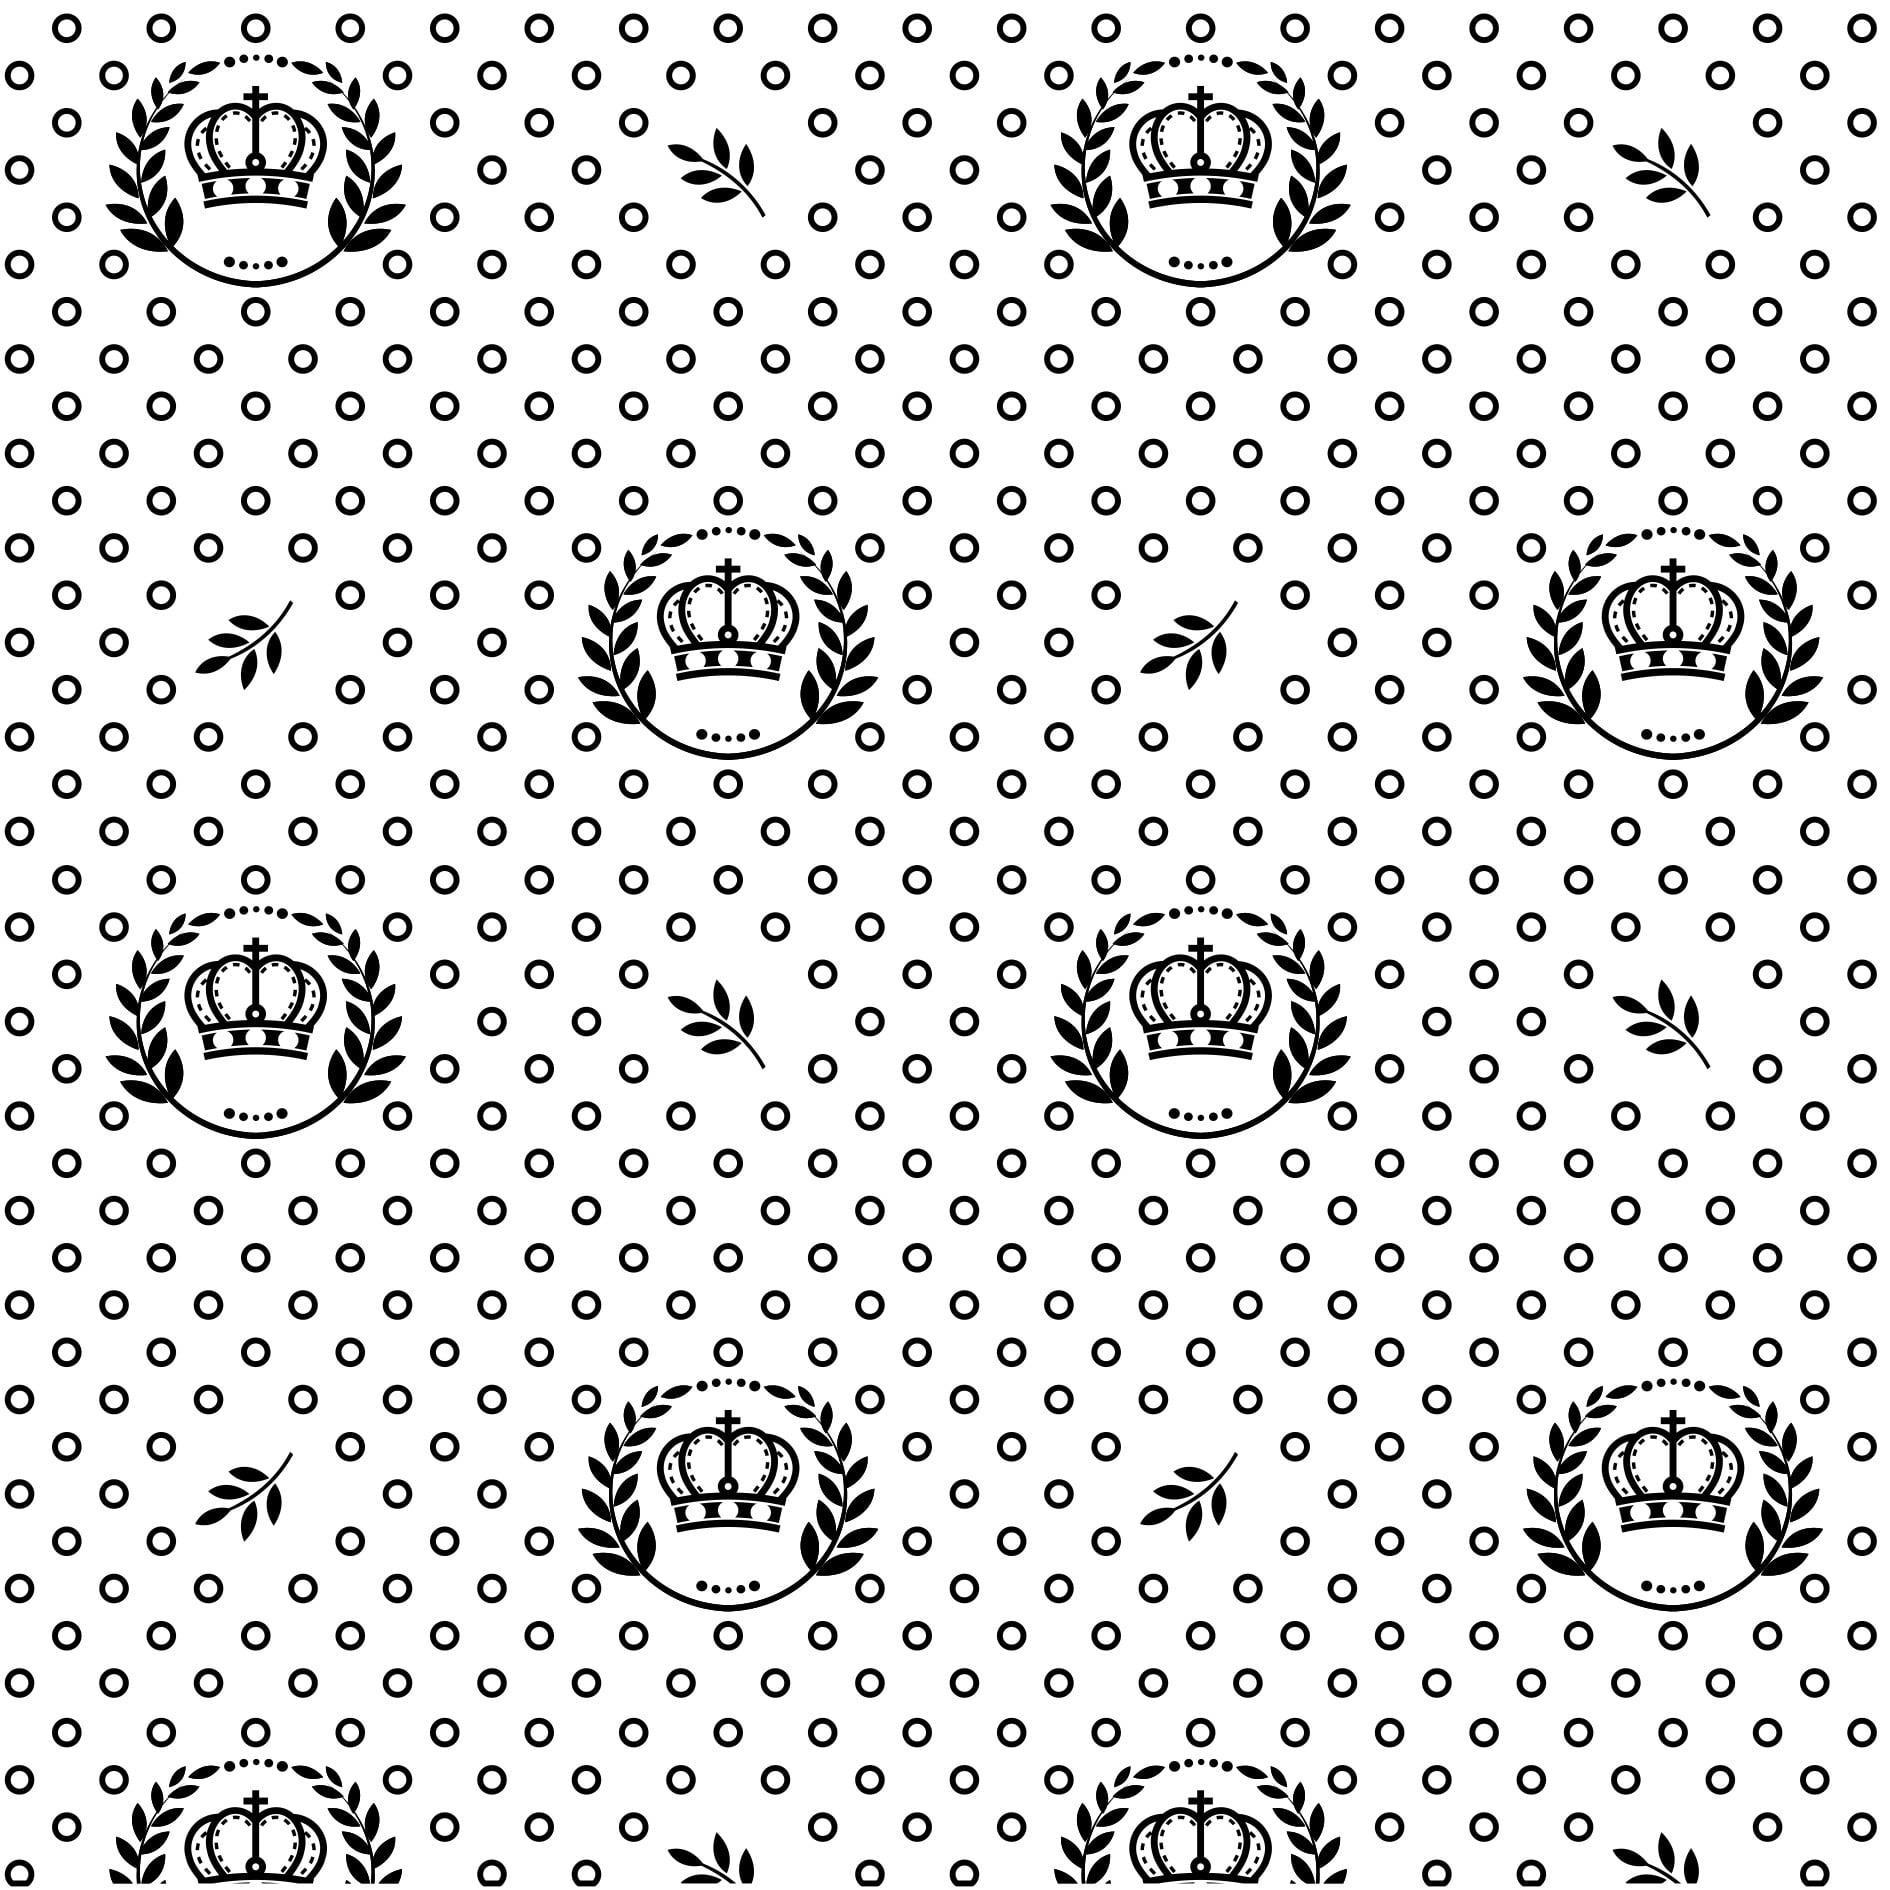 Tecido Tricoline Branco Coroas e Ramos Preto